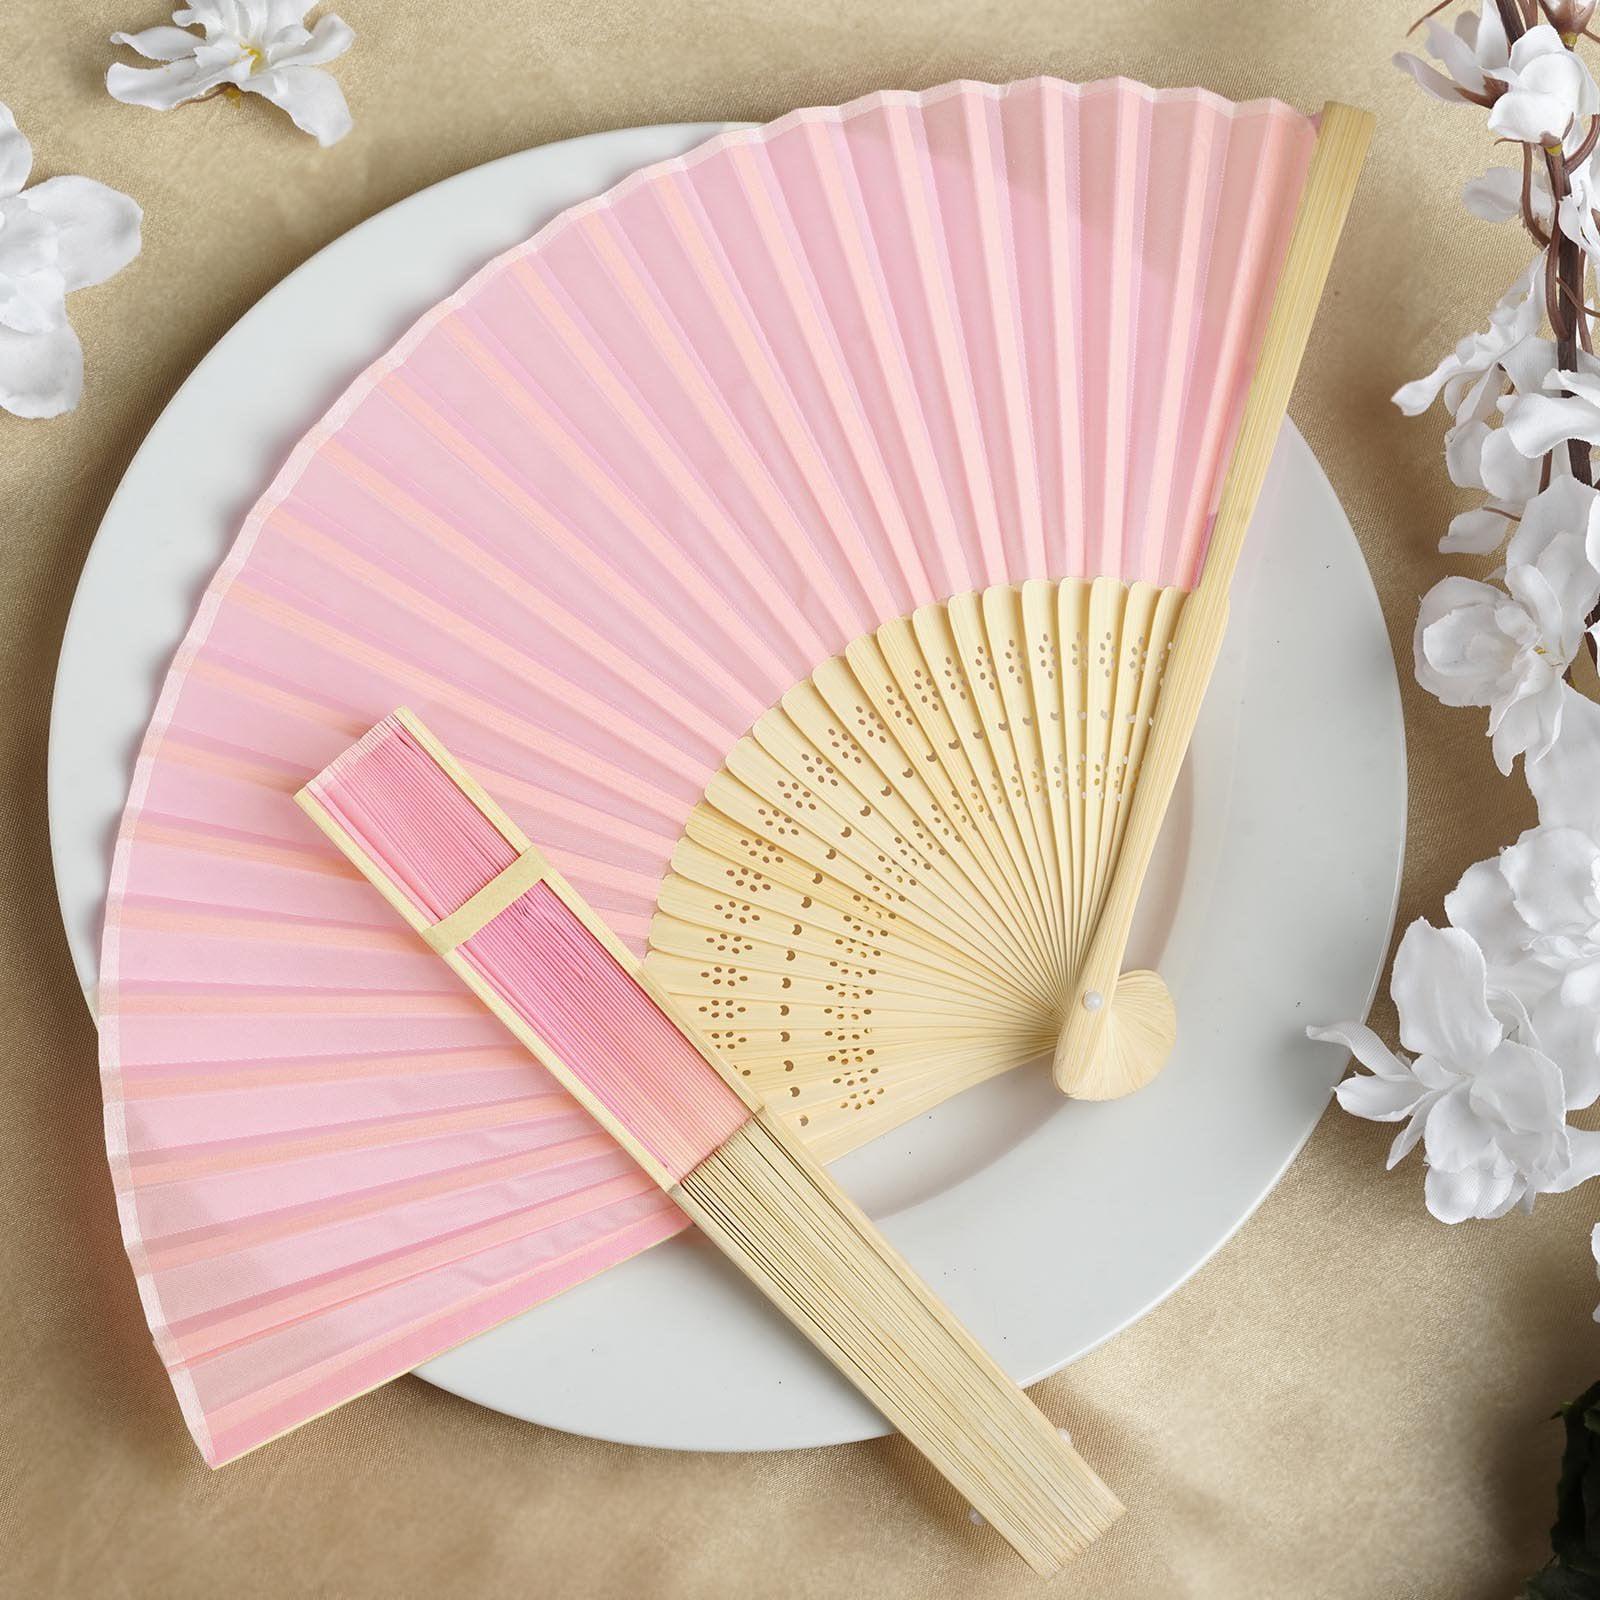 Efavormart Lot Of 50 Wholesale Silk Folding Birthday Banquet Event Wedding Party Favor Fans 17 Colors Available Walmart Com